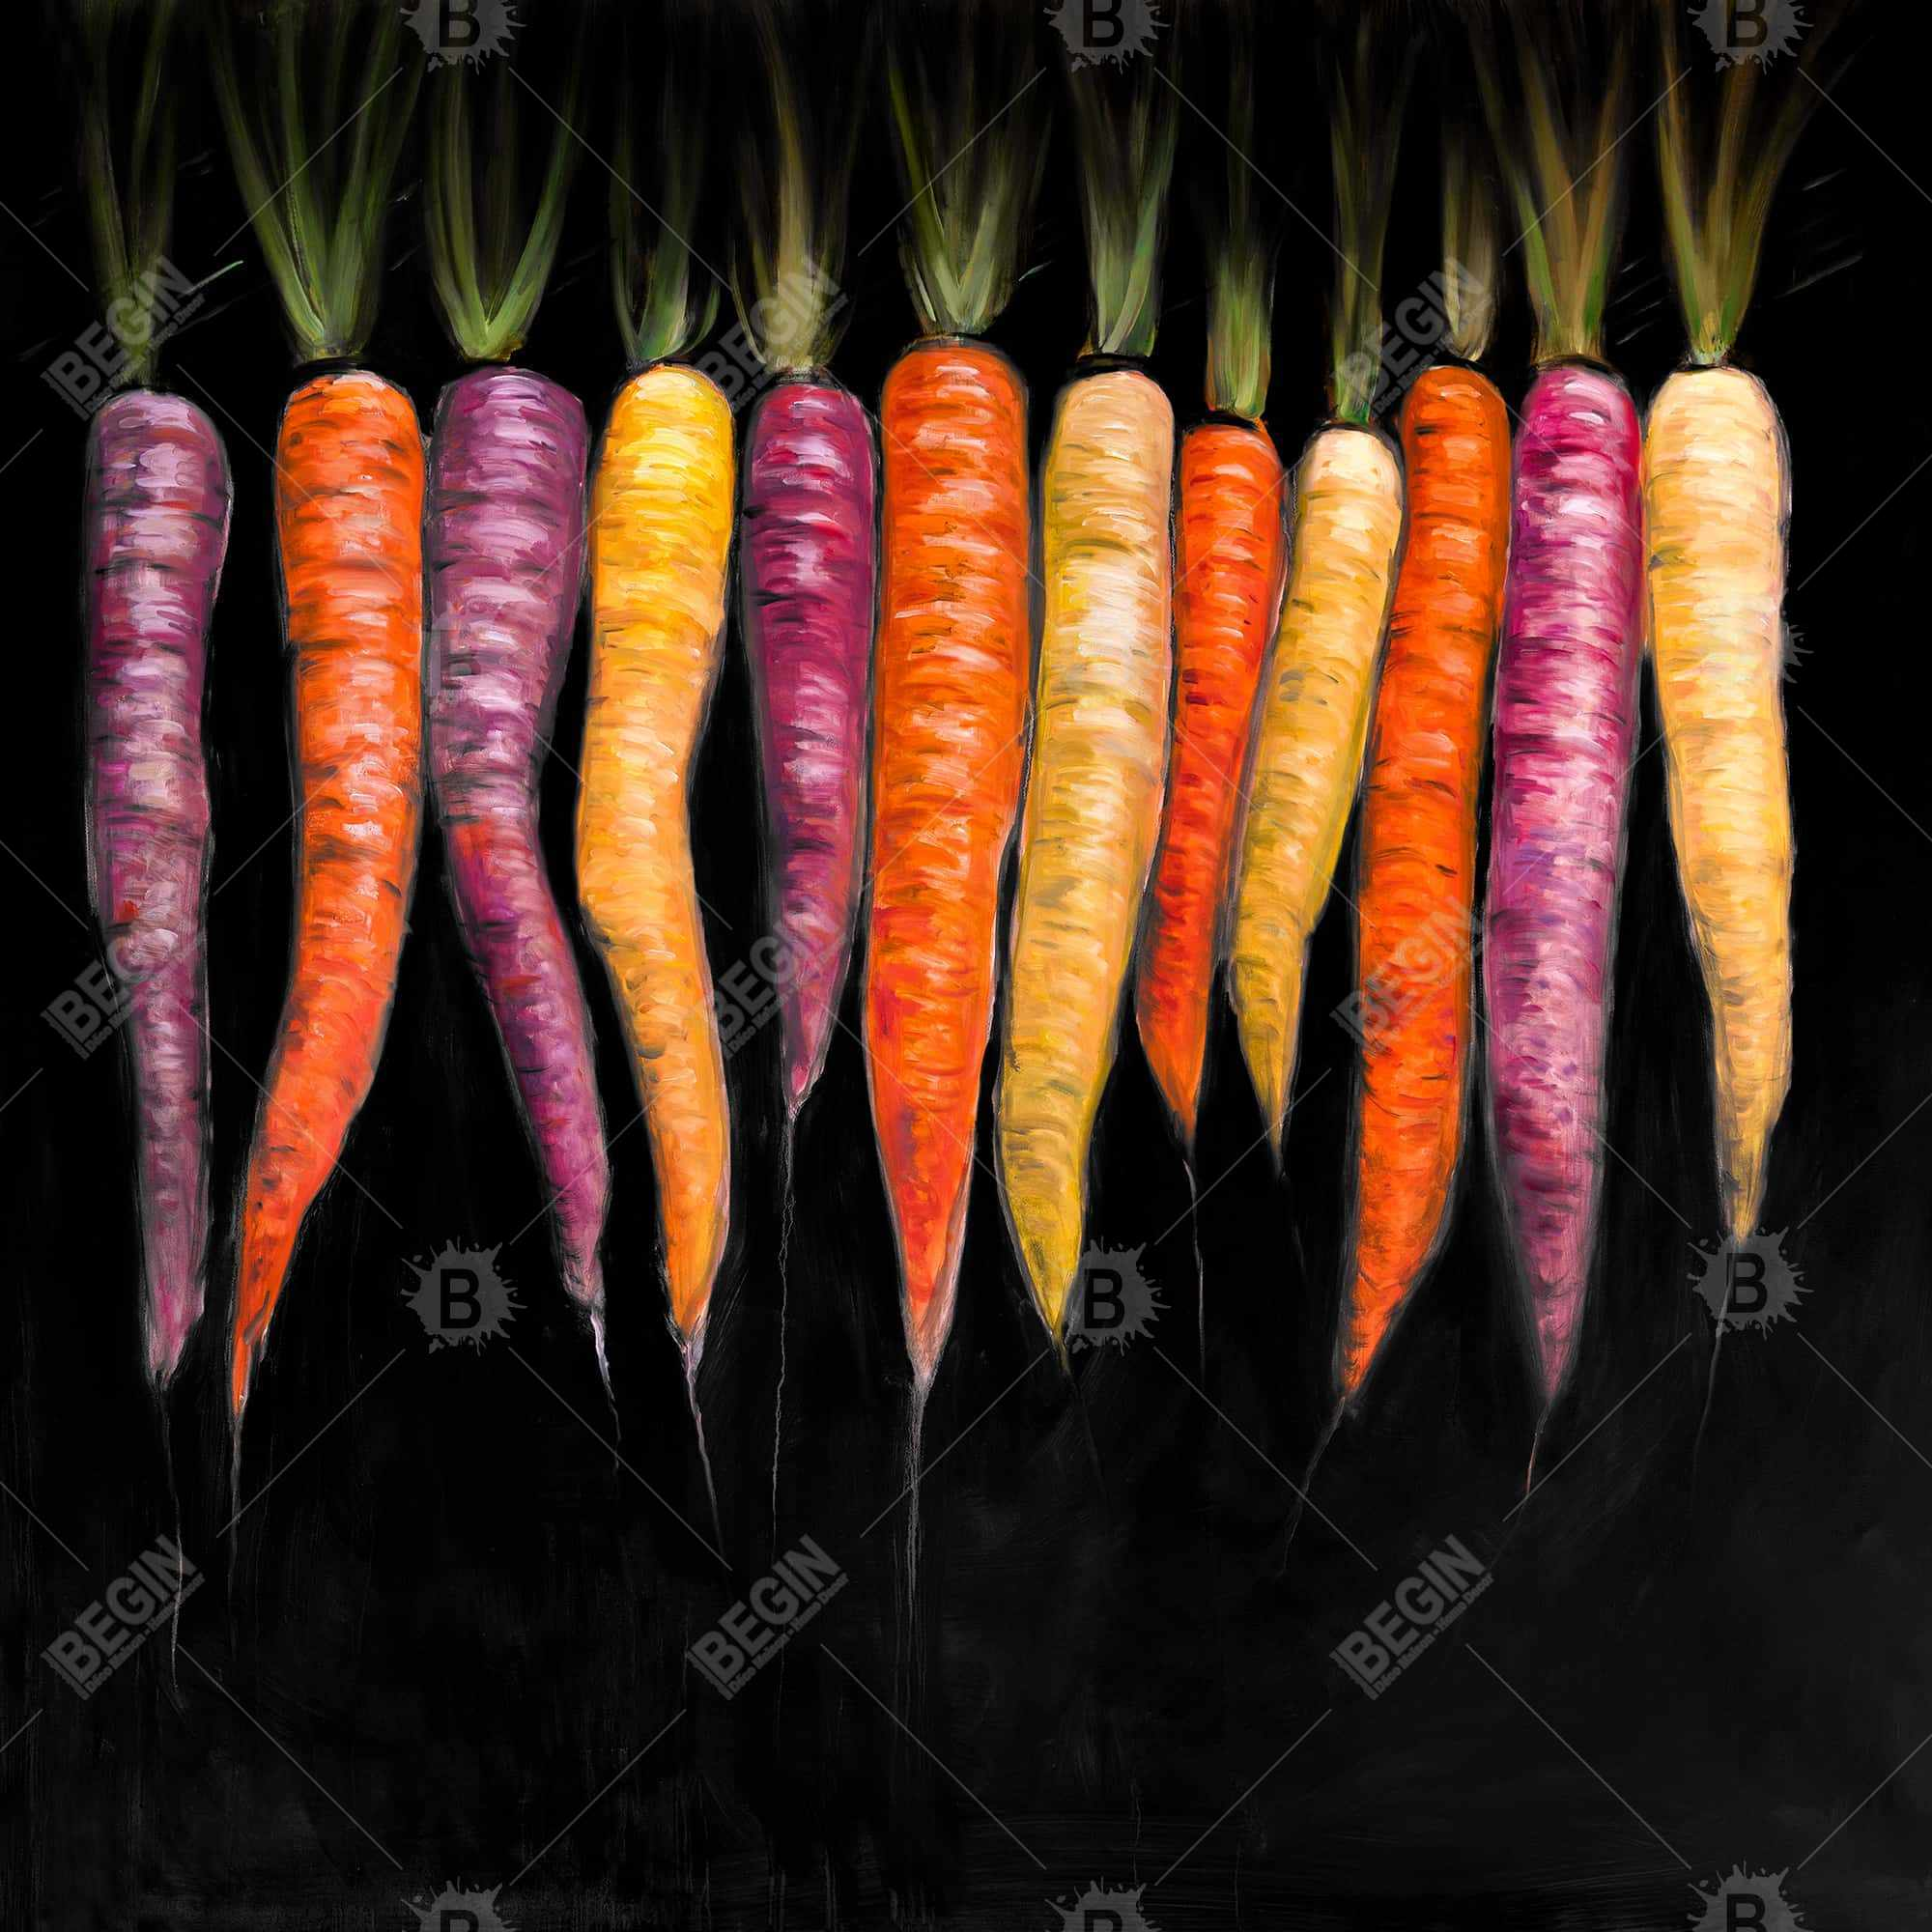 Carrots varieties